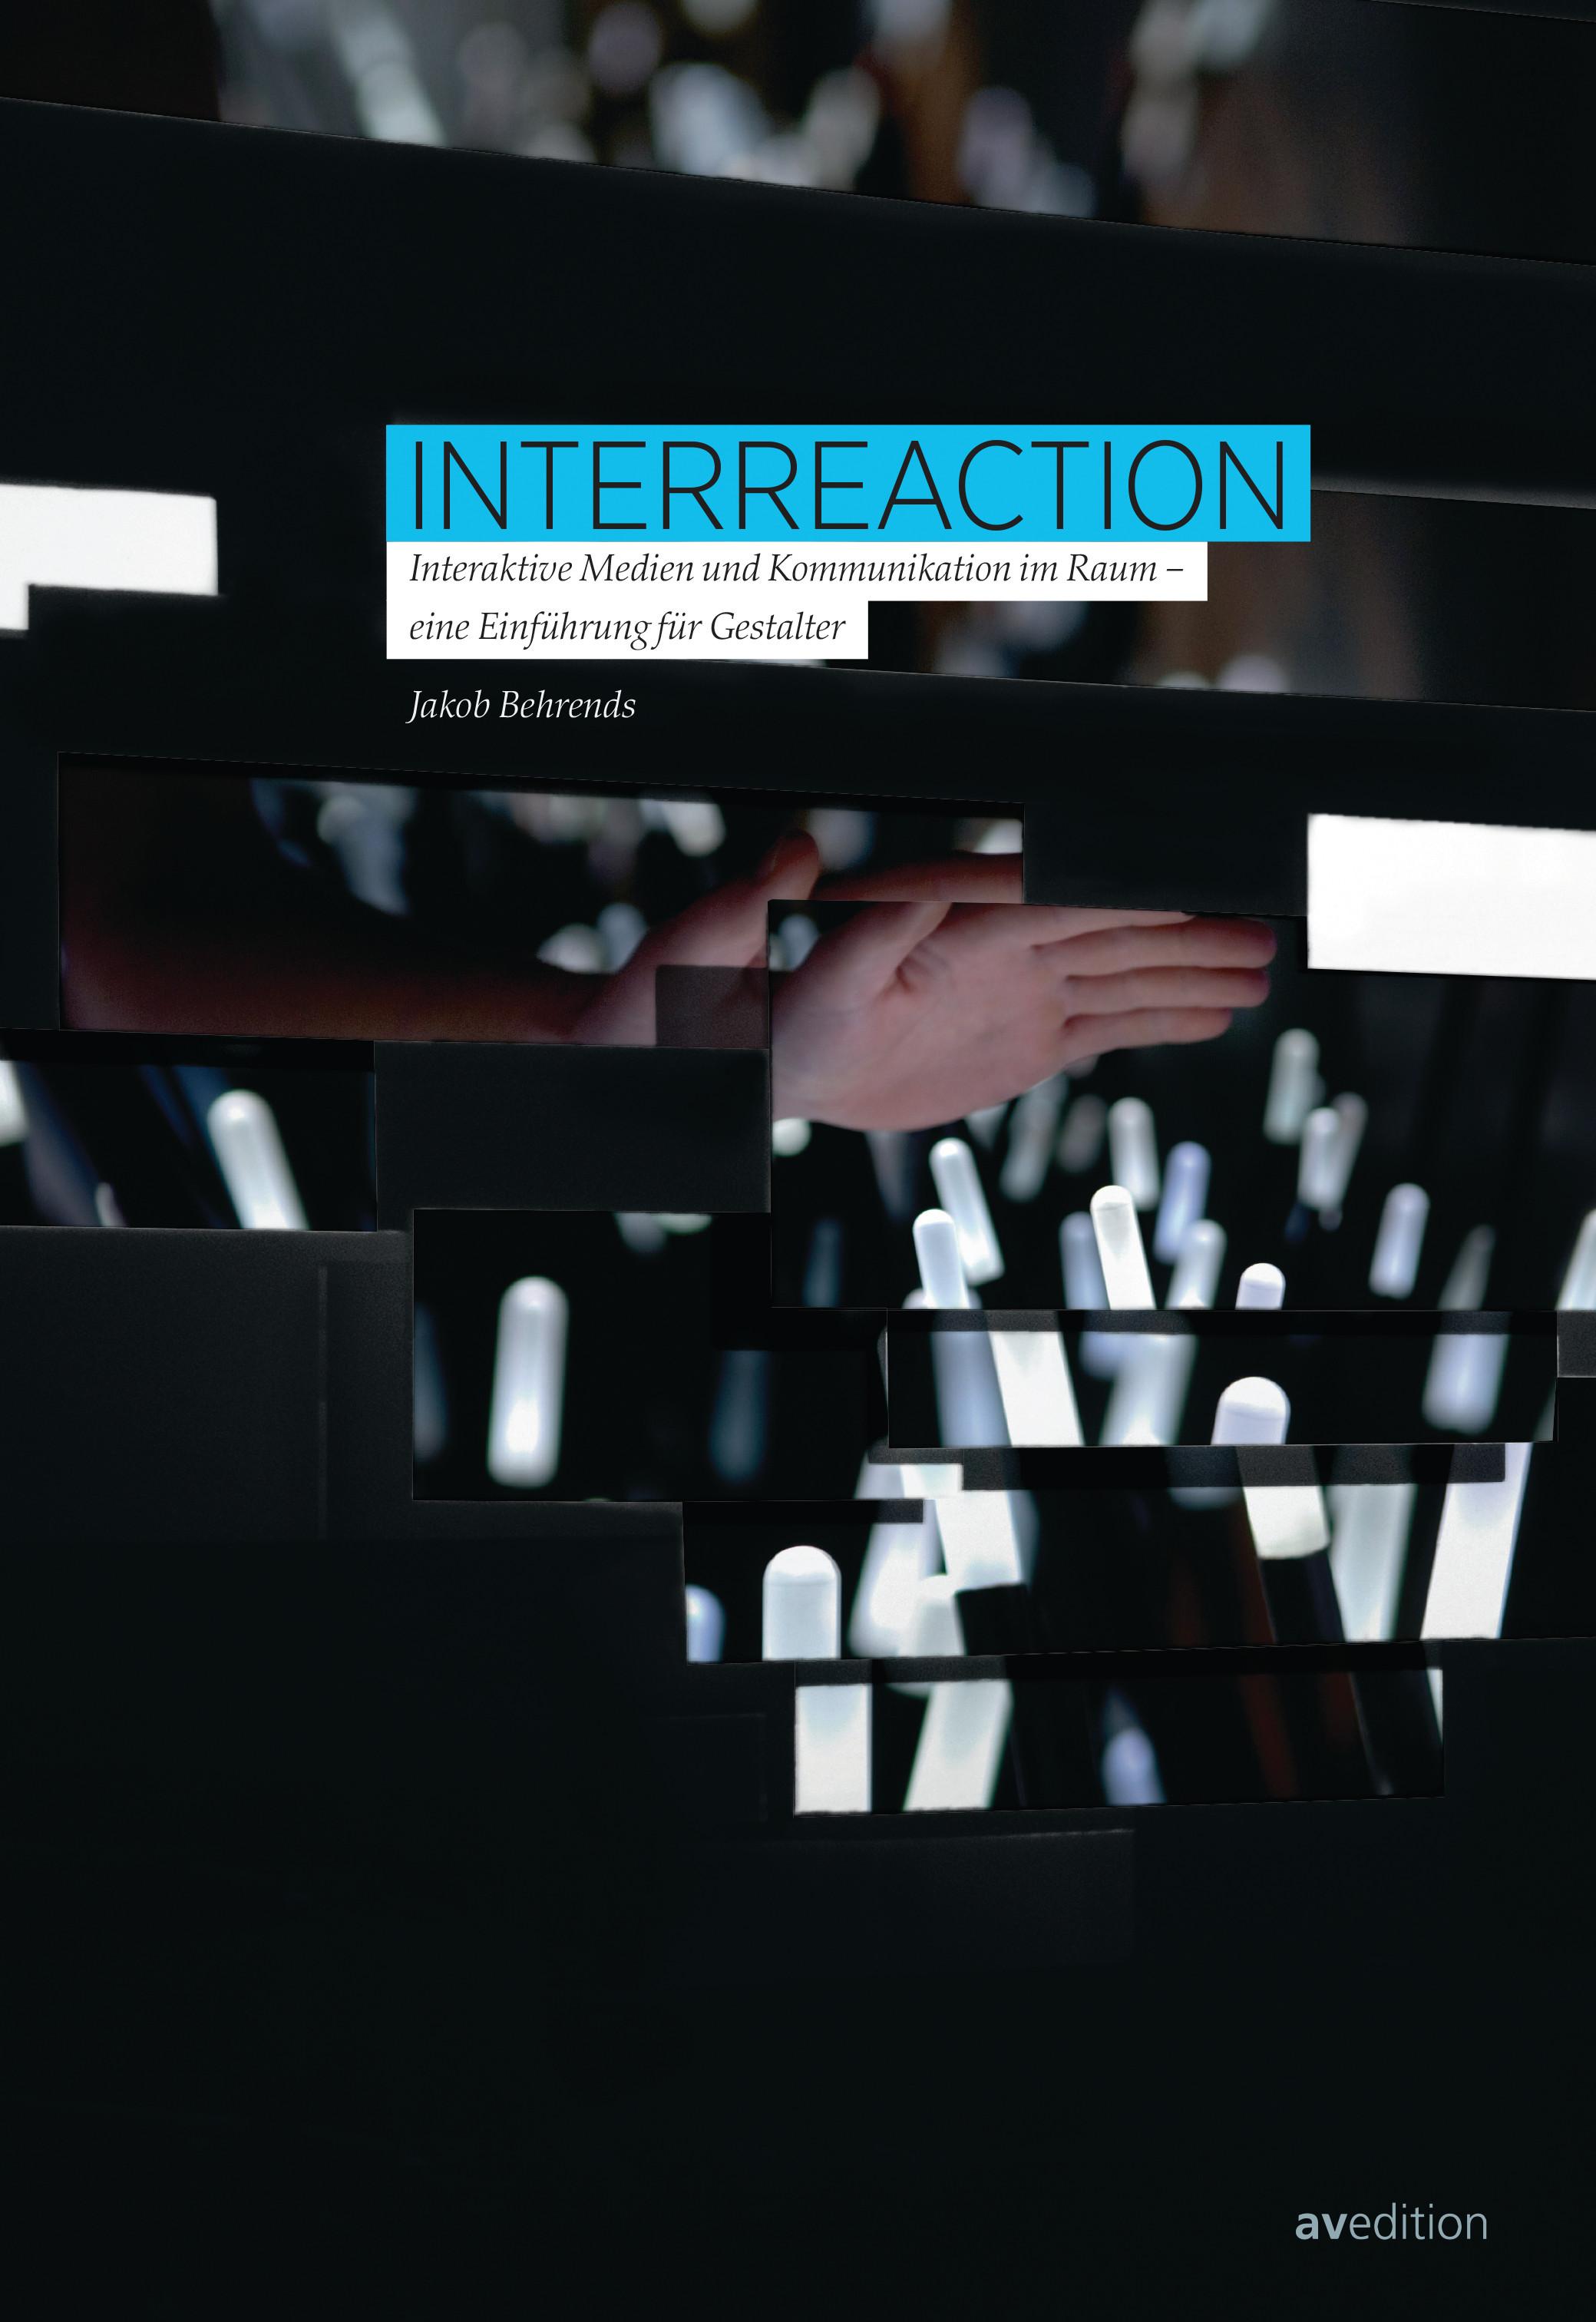 Interreaction Jakob Behrends